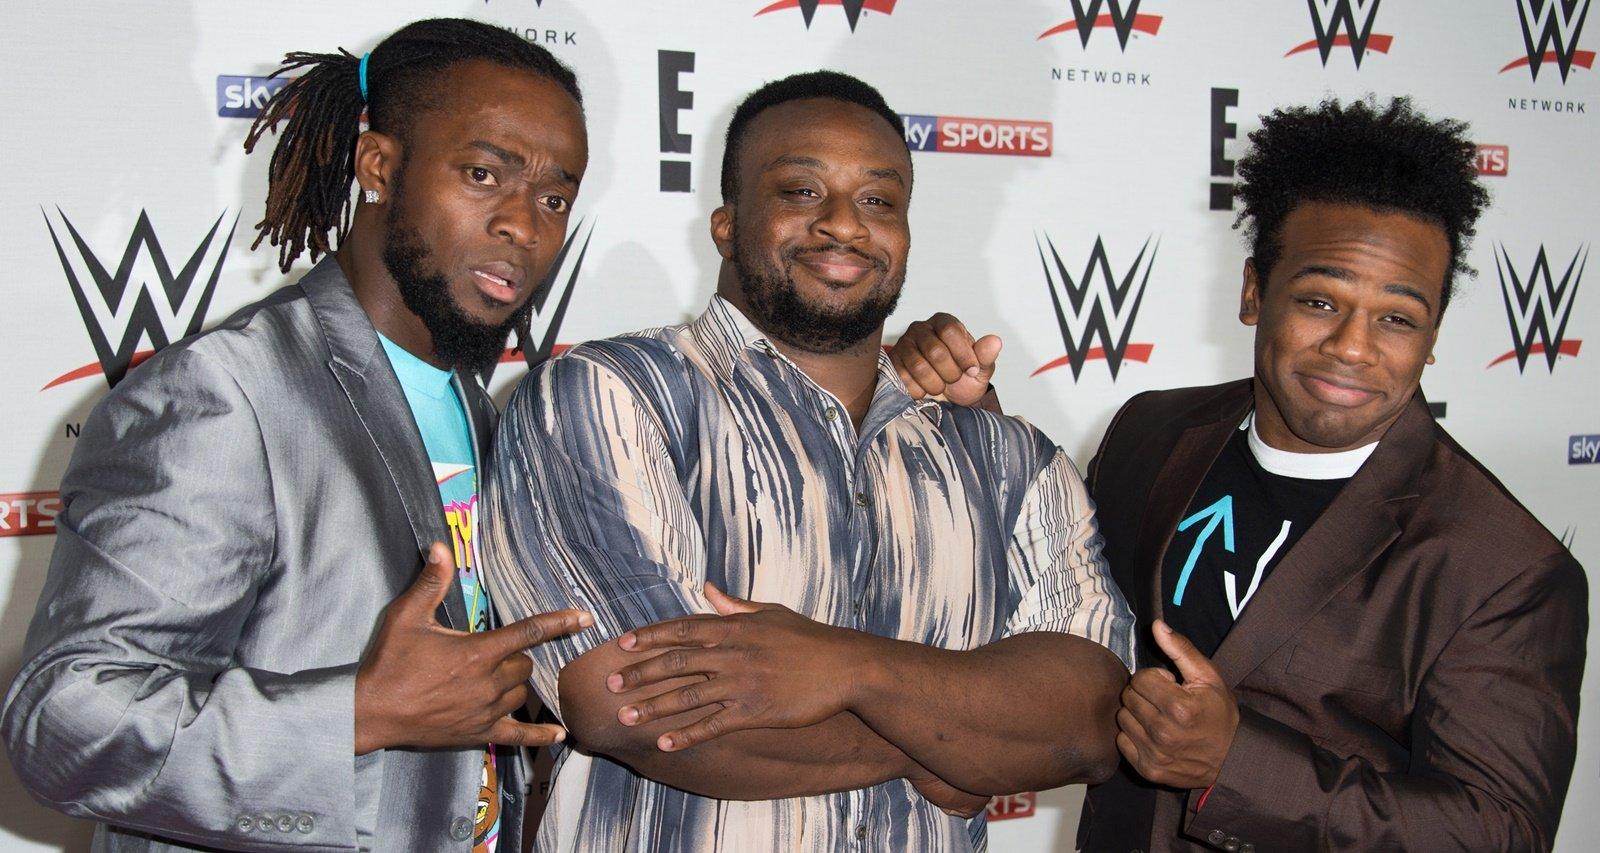 WWE: Big E Injury Update, Big O, Expected Return, What Next? Big E vs Big O?